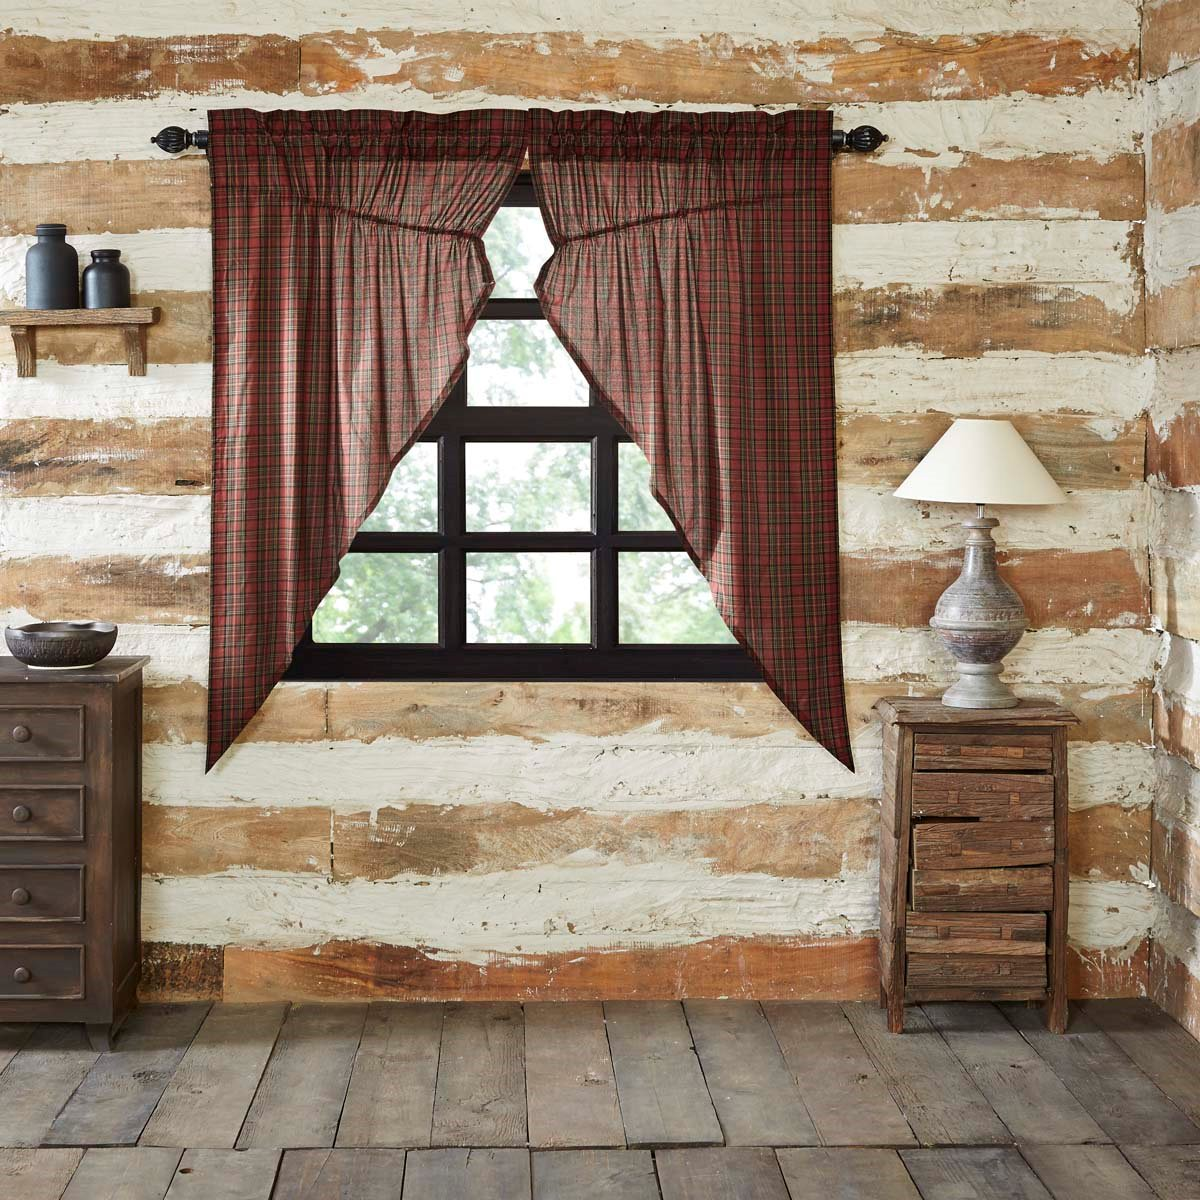 Tartan Red Plaid Prairie Curtain set of 2 (63L x 36W)